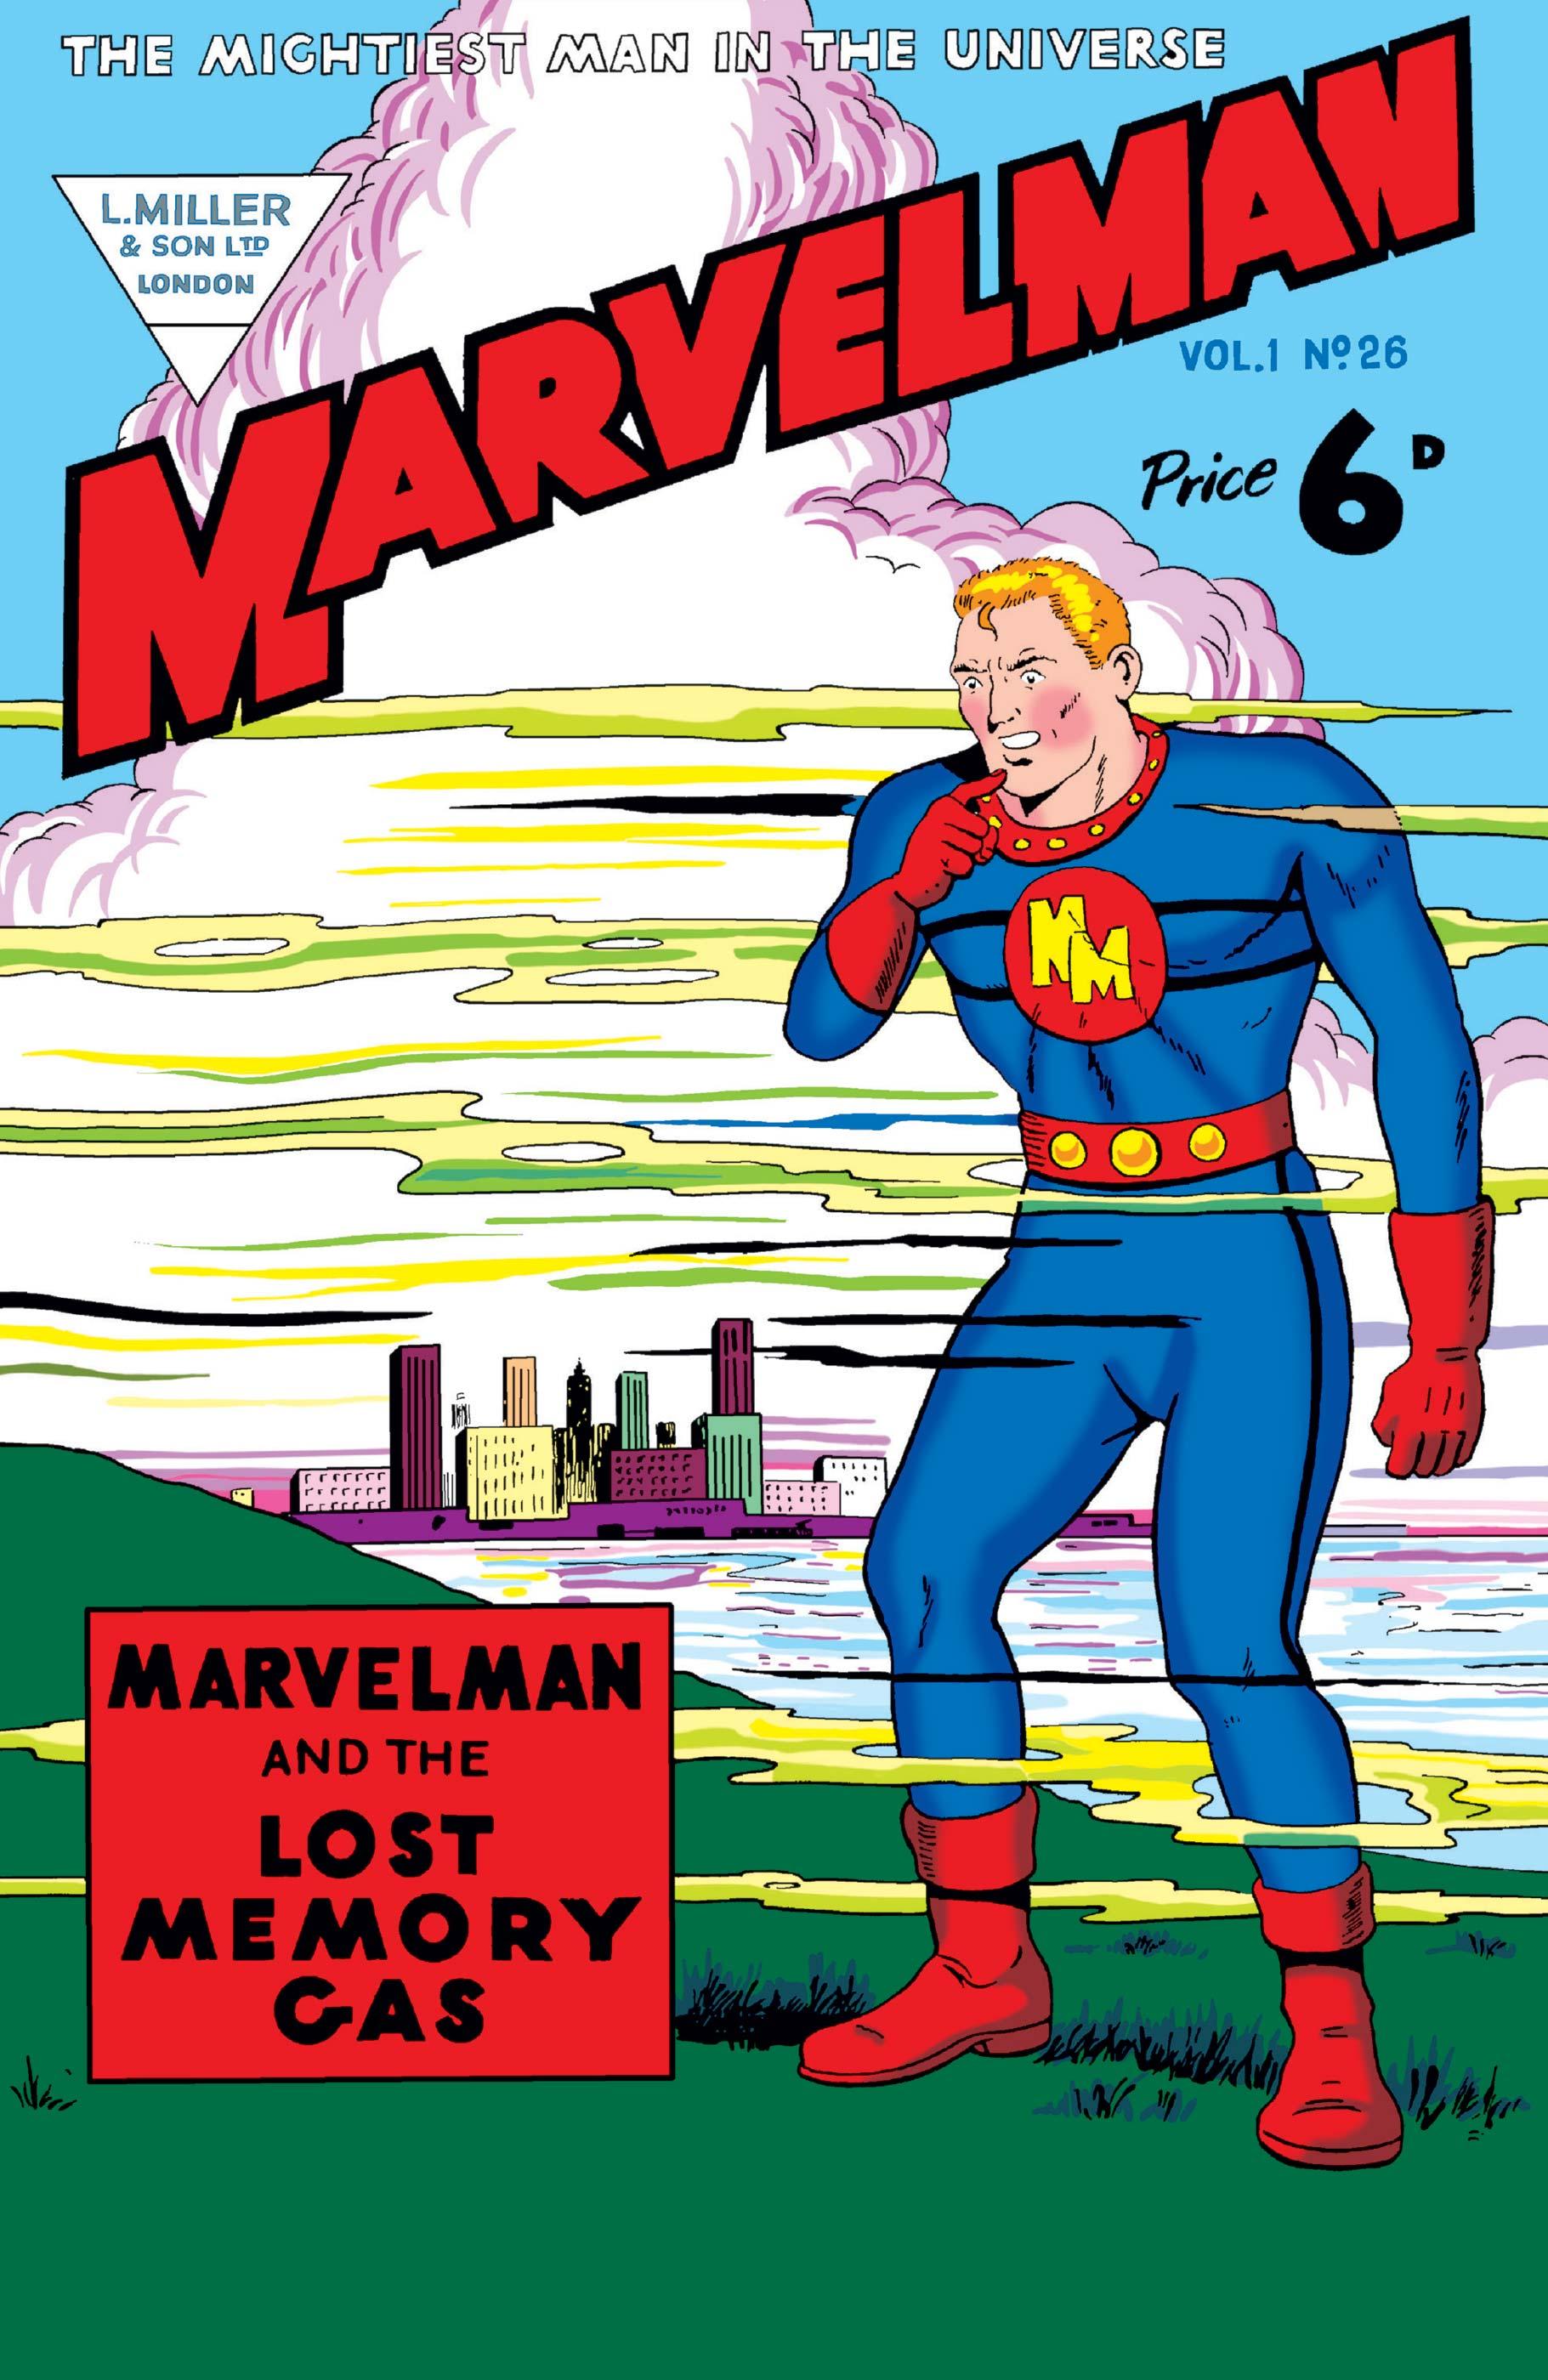 Marvelman (1954) #26